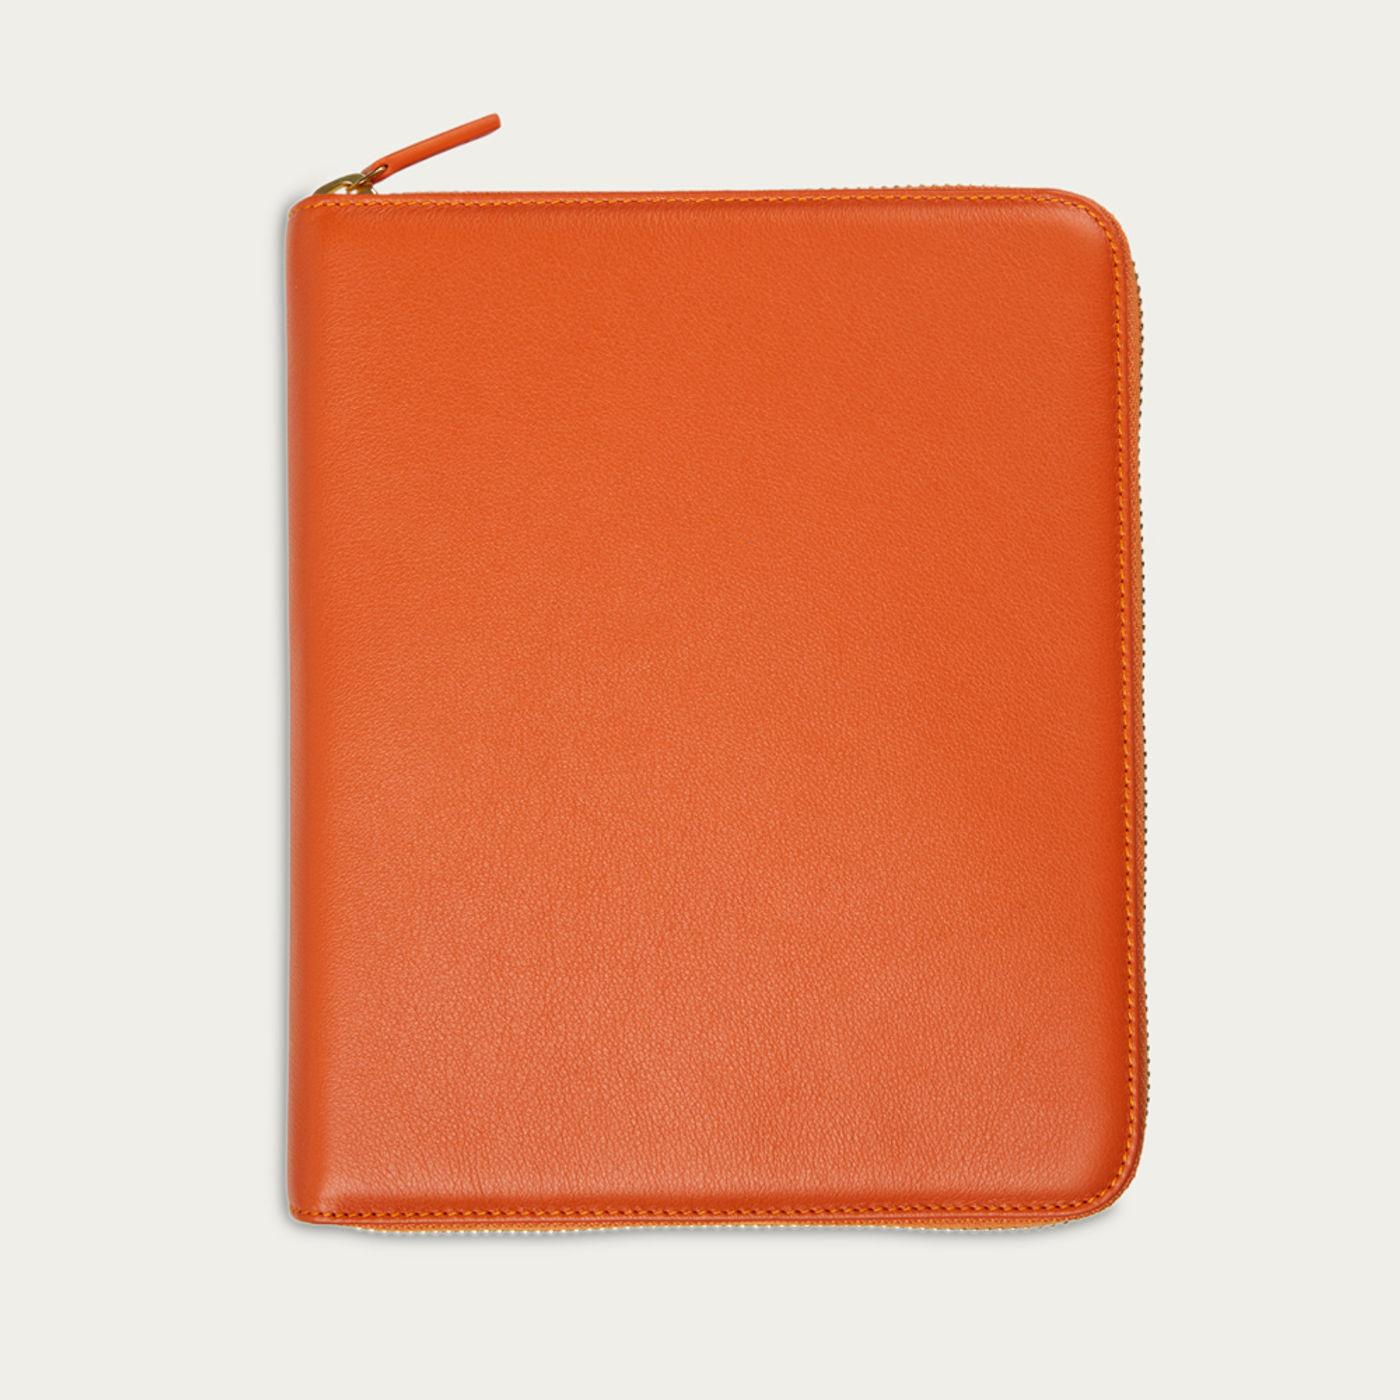 Amber Orange & Dusty Aqua The First Class Leather Tech Case   Bombinate